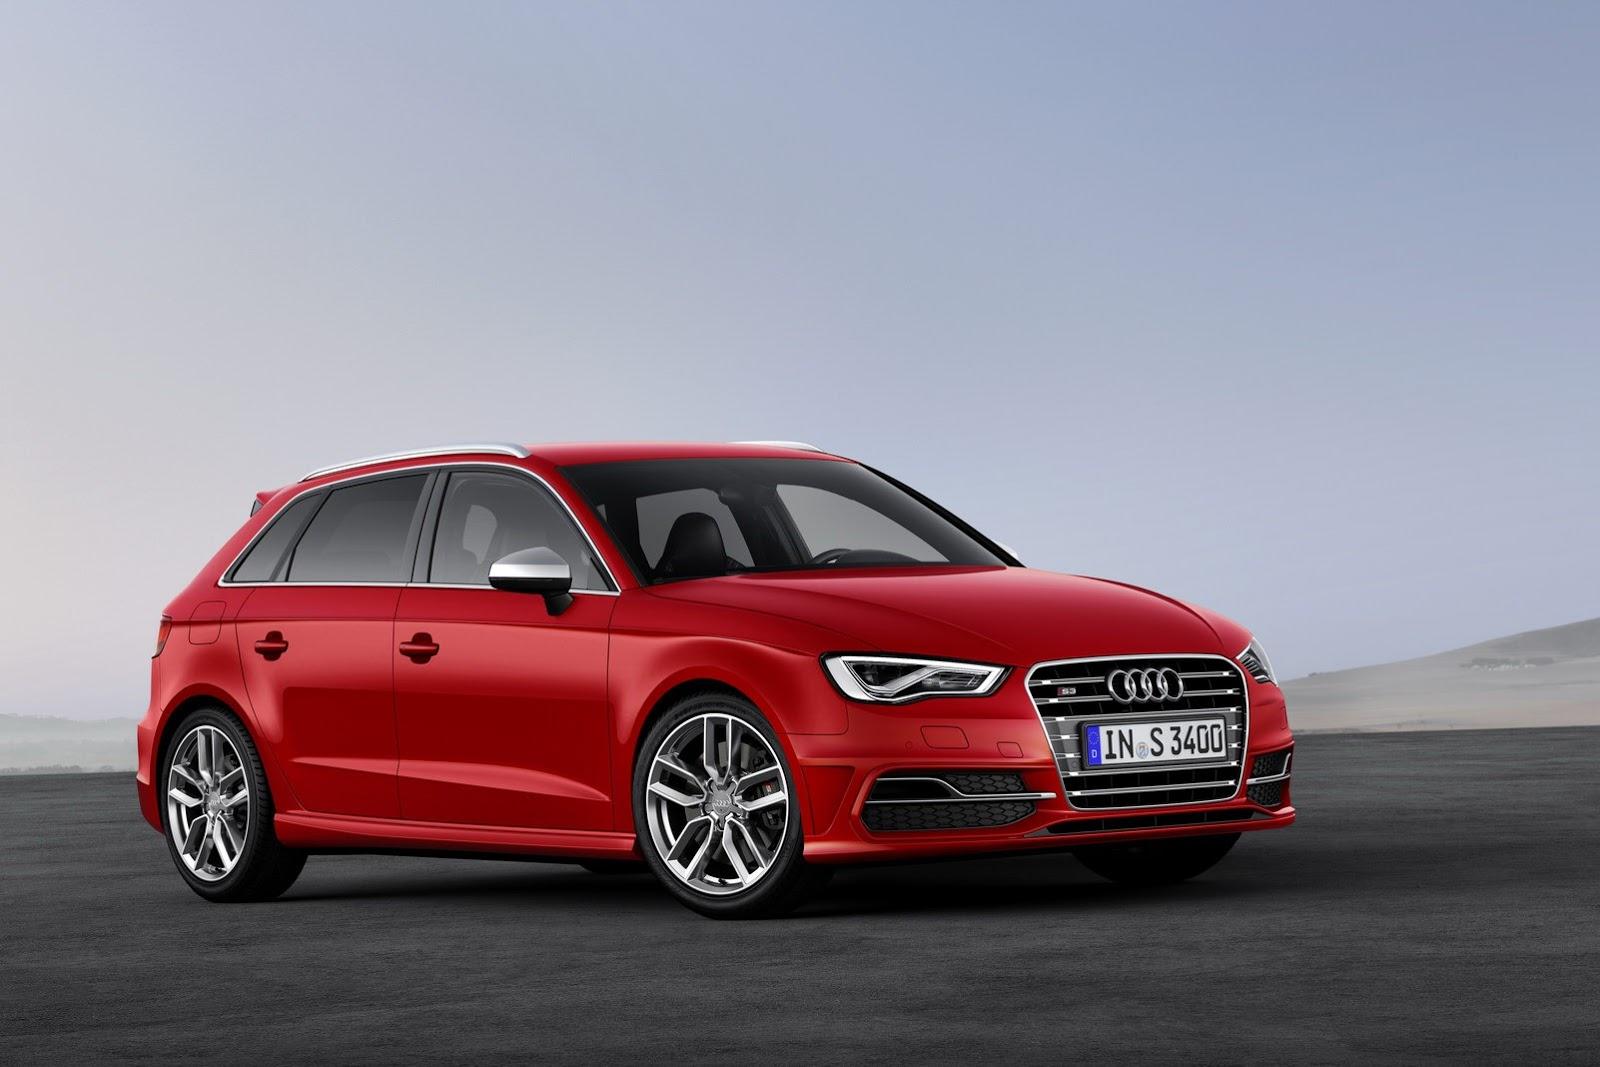 Audi-S3-Sportback-9%5B2%5D.jpg